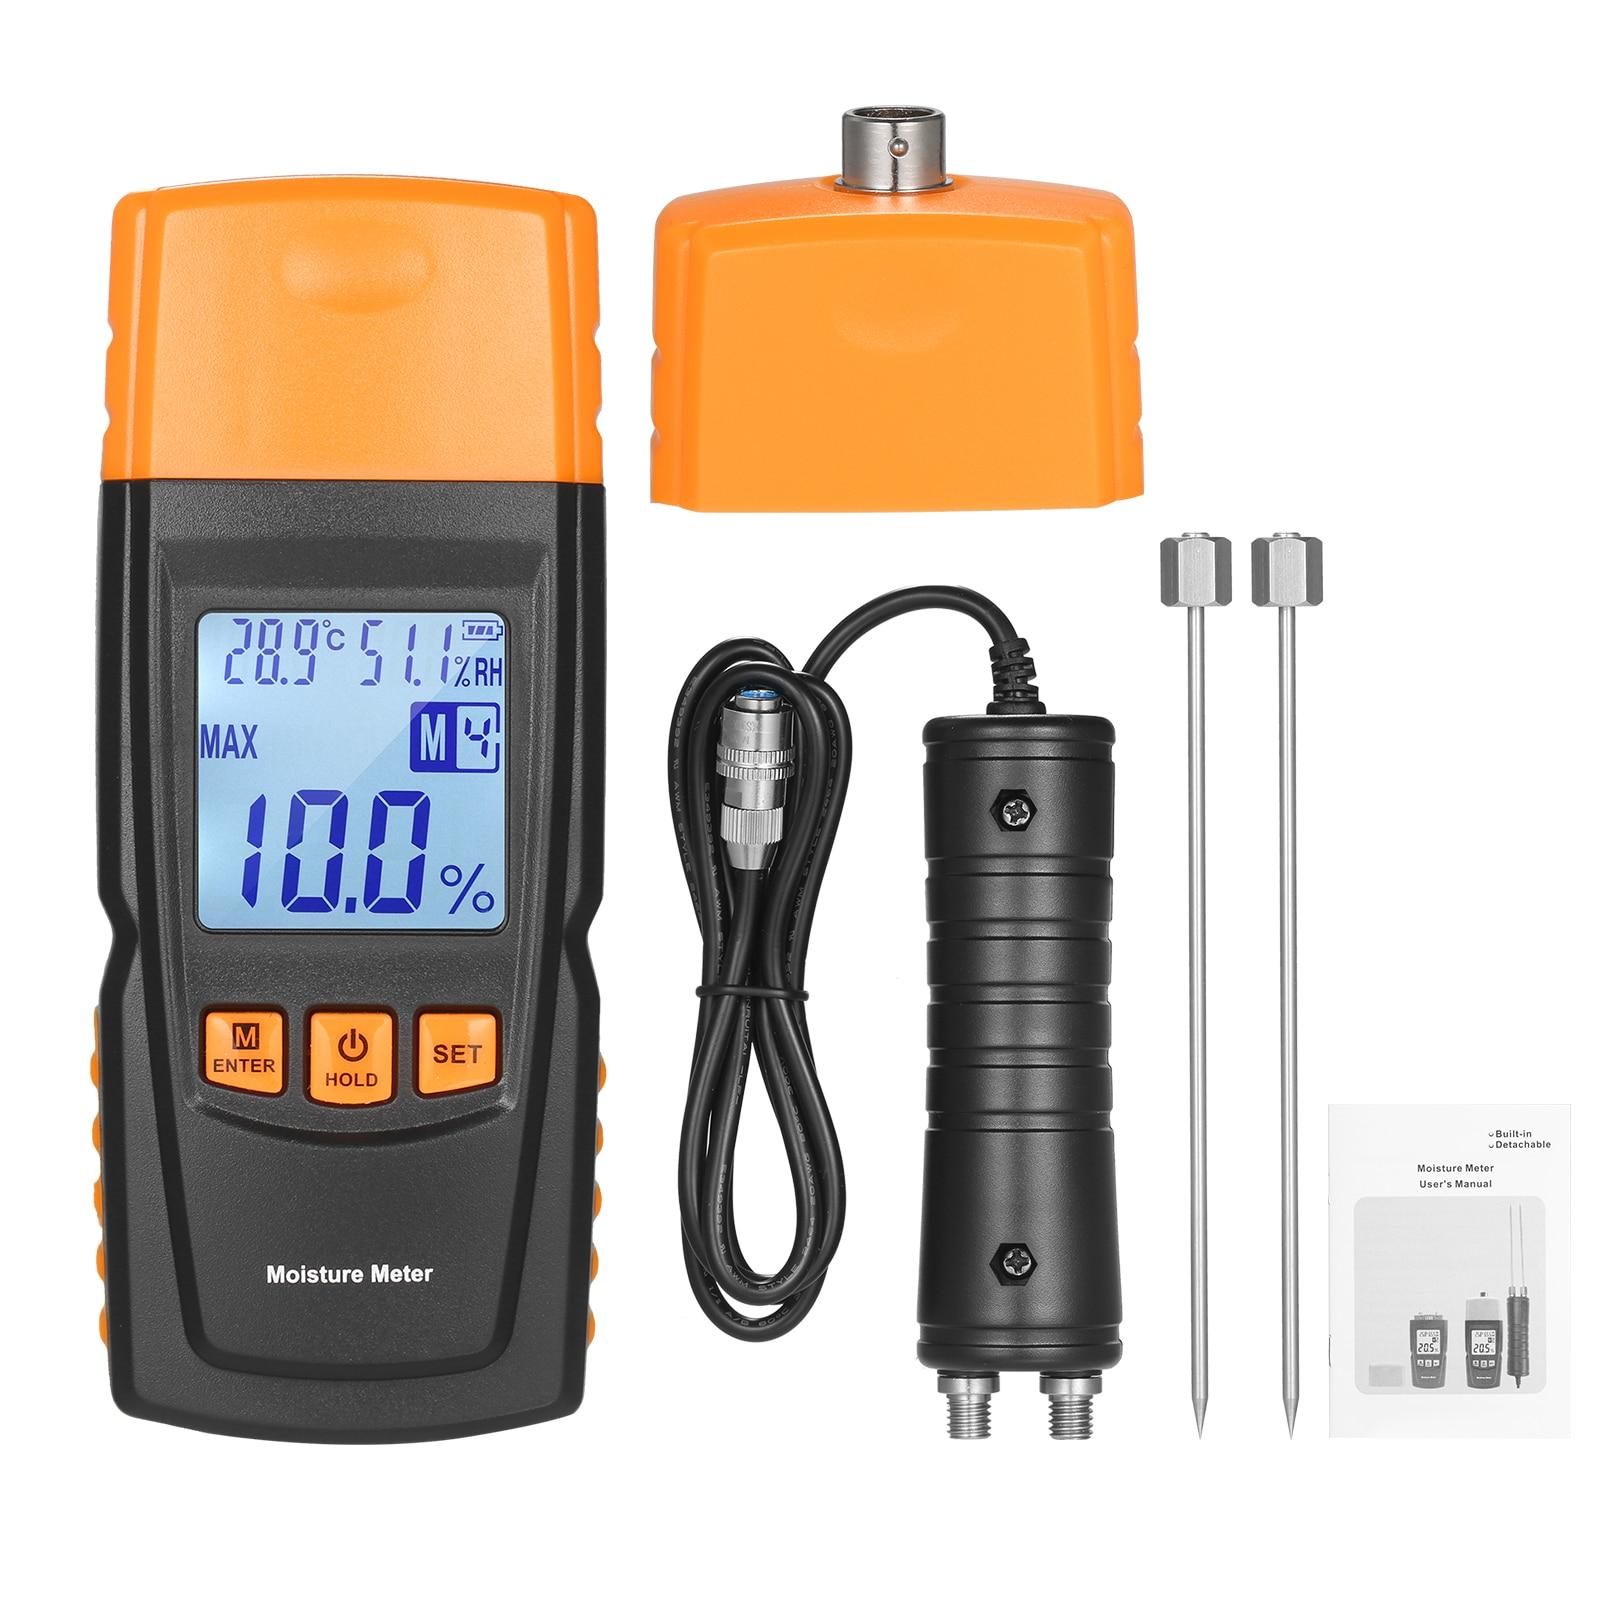 KKmoon 3-in-1 الرقمية الخشب مقياس الرطوبة الحطب محتوى الماء محلل درجة الحرارة المحيطة + الرطوبة + اختبار الرطوبة الخشب